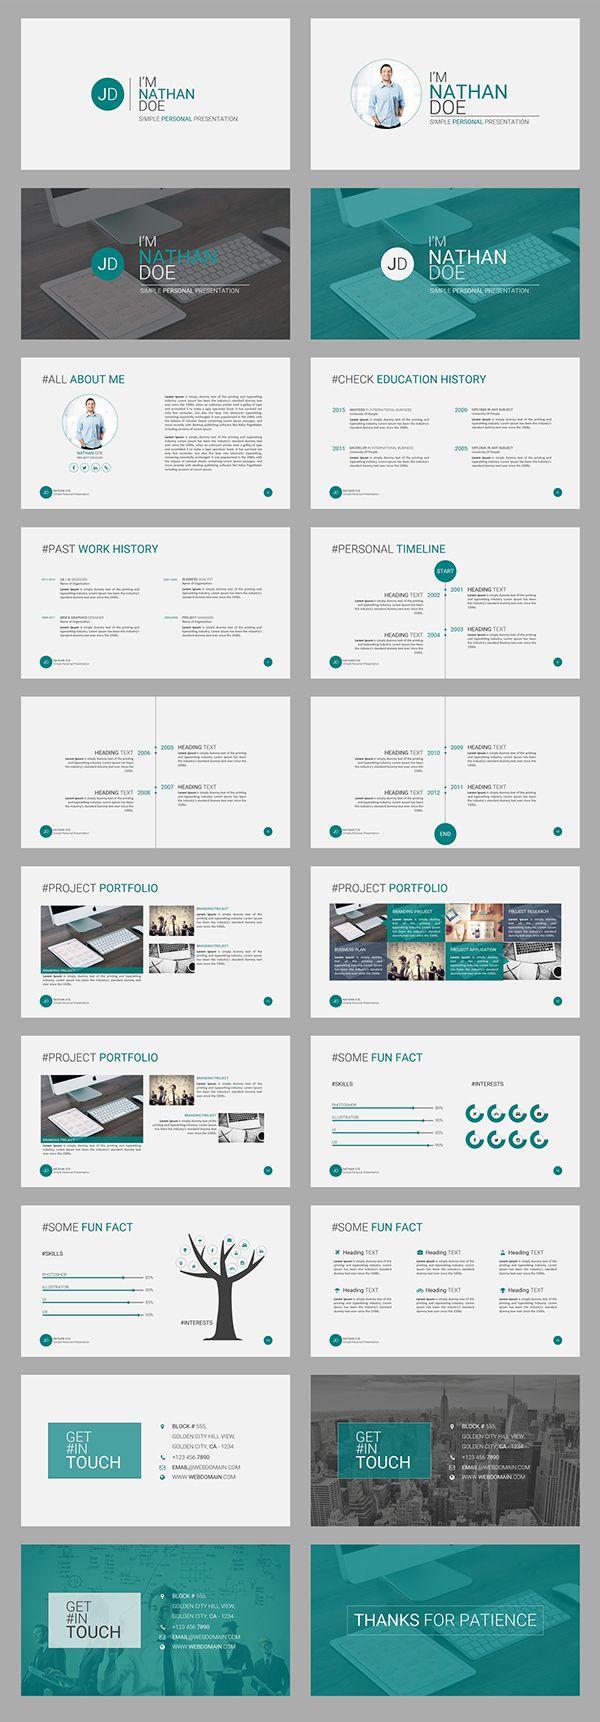 """JD Personal (CV/Resume) Powerpoint Presentation"